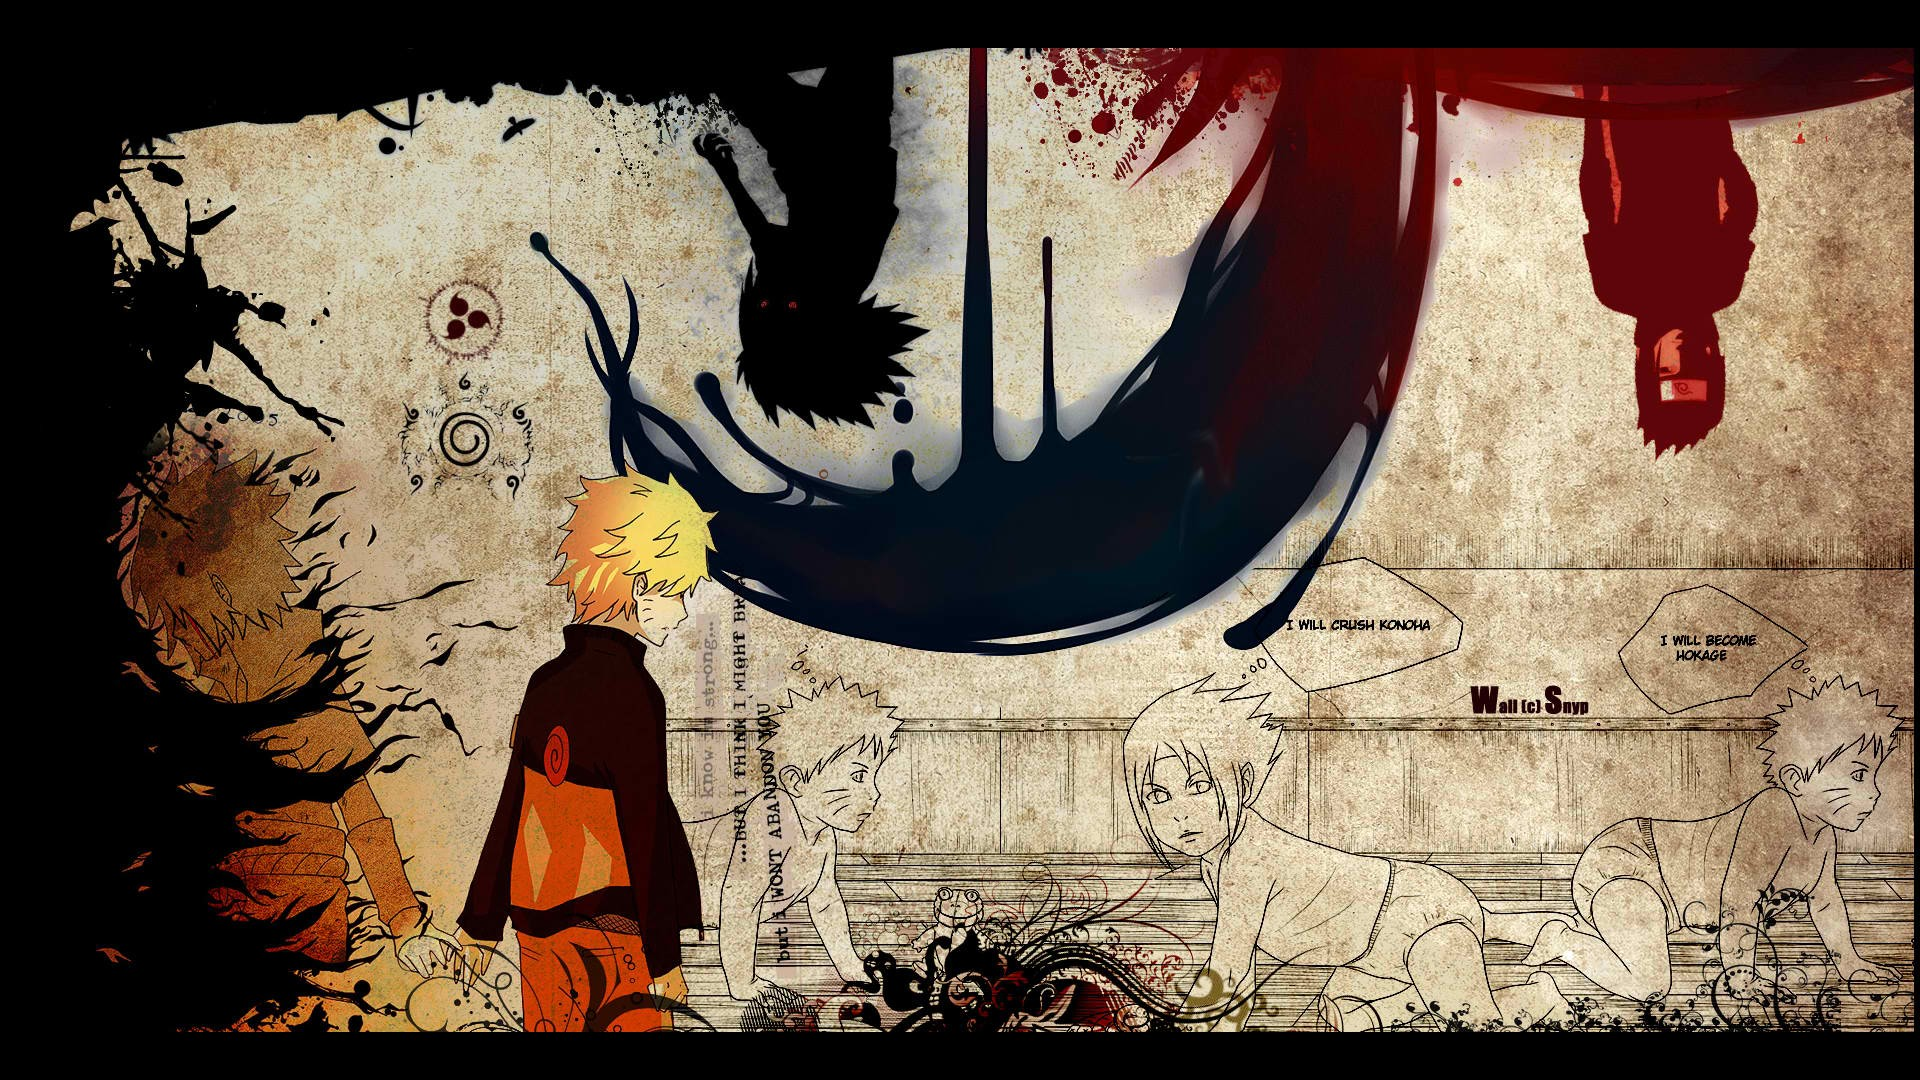 Must see Wallpaper Naruto Silhouette - silhouette-uchiha-sasuke-naruto-shippuden-uzumaki-anime  Pic.jpg